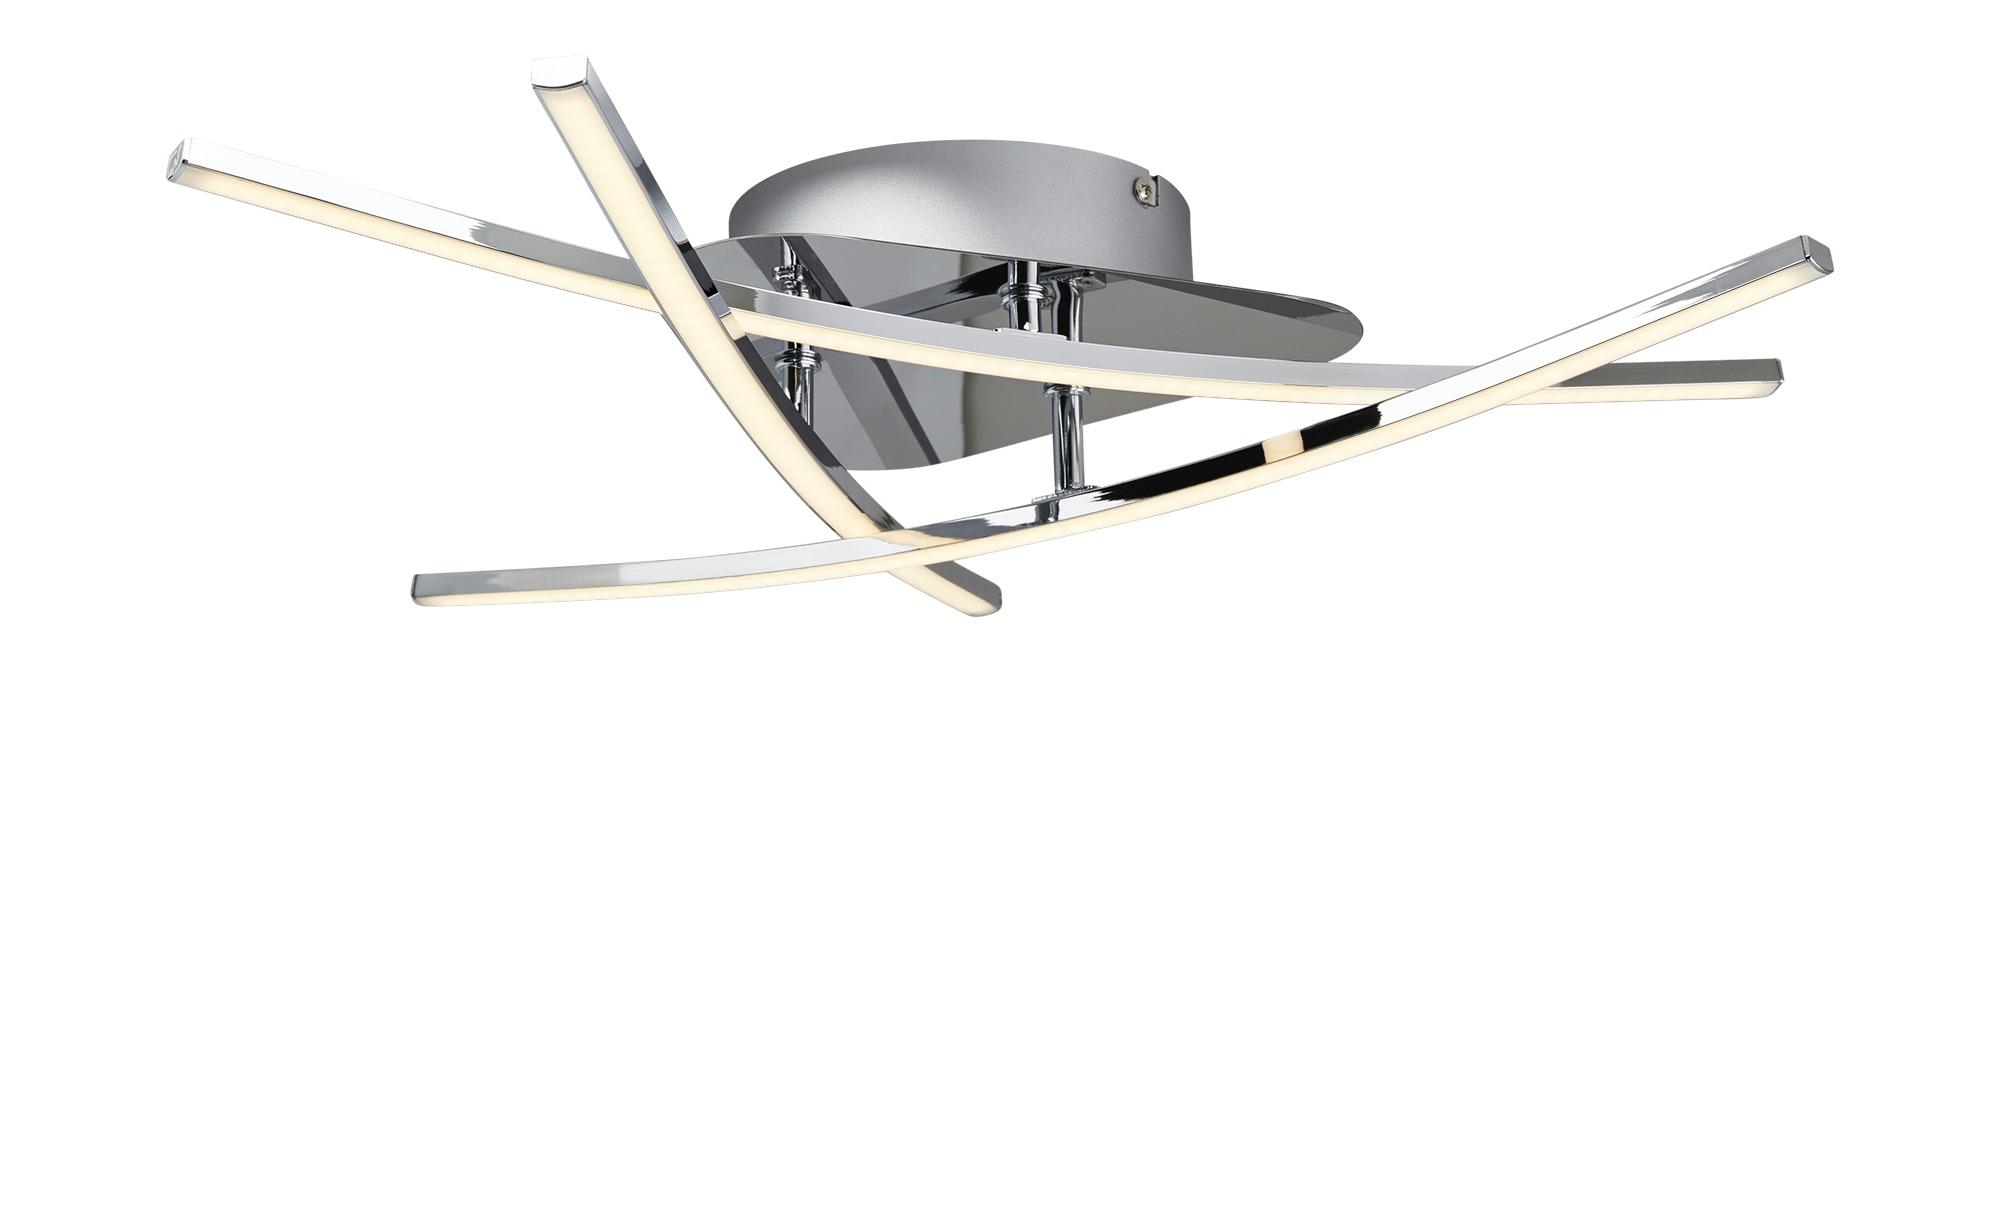 KHG LED-Deckenleuchte, 3-flammig ¦ silber ¦ Maße (cm): B: 57 H: 9 Lampen & Leuchten > Innenleuchten > Deckenleuchten - Höffner